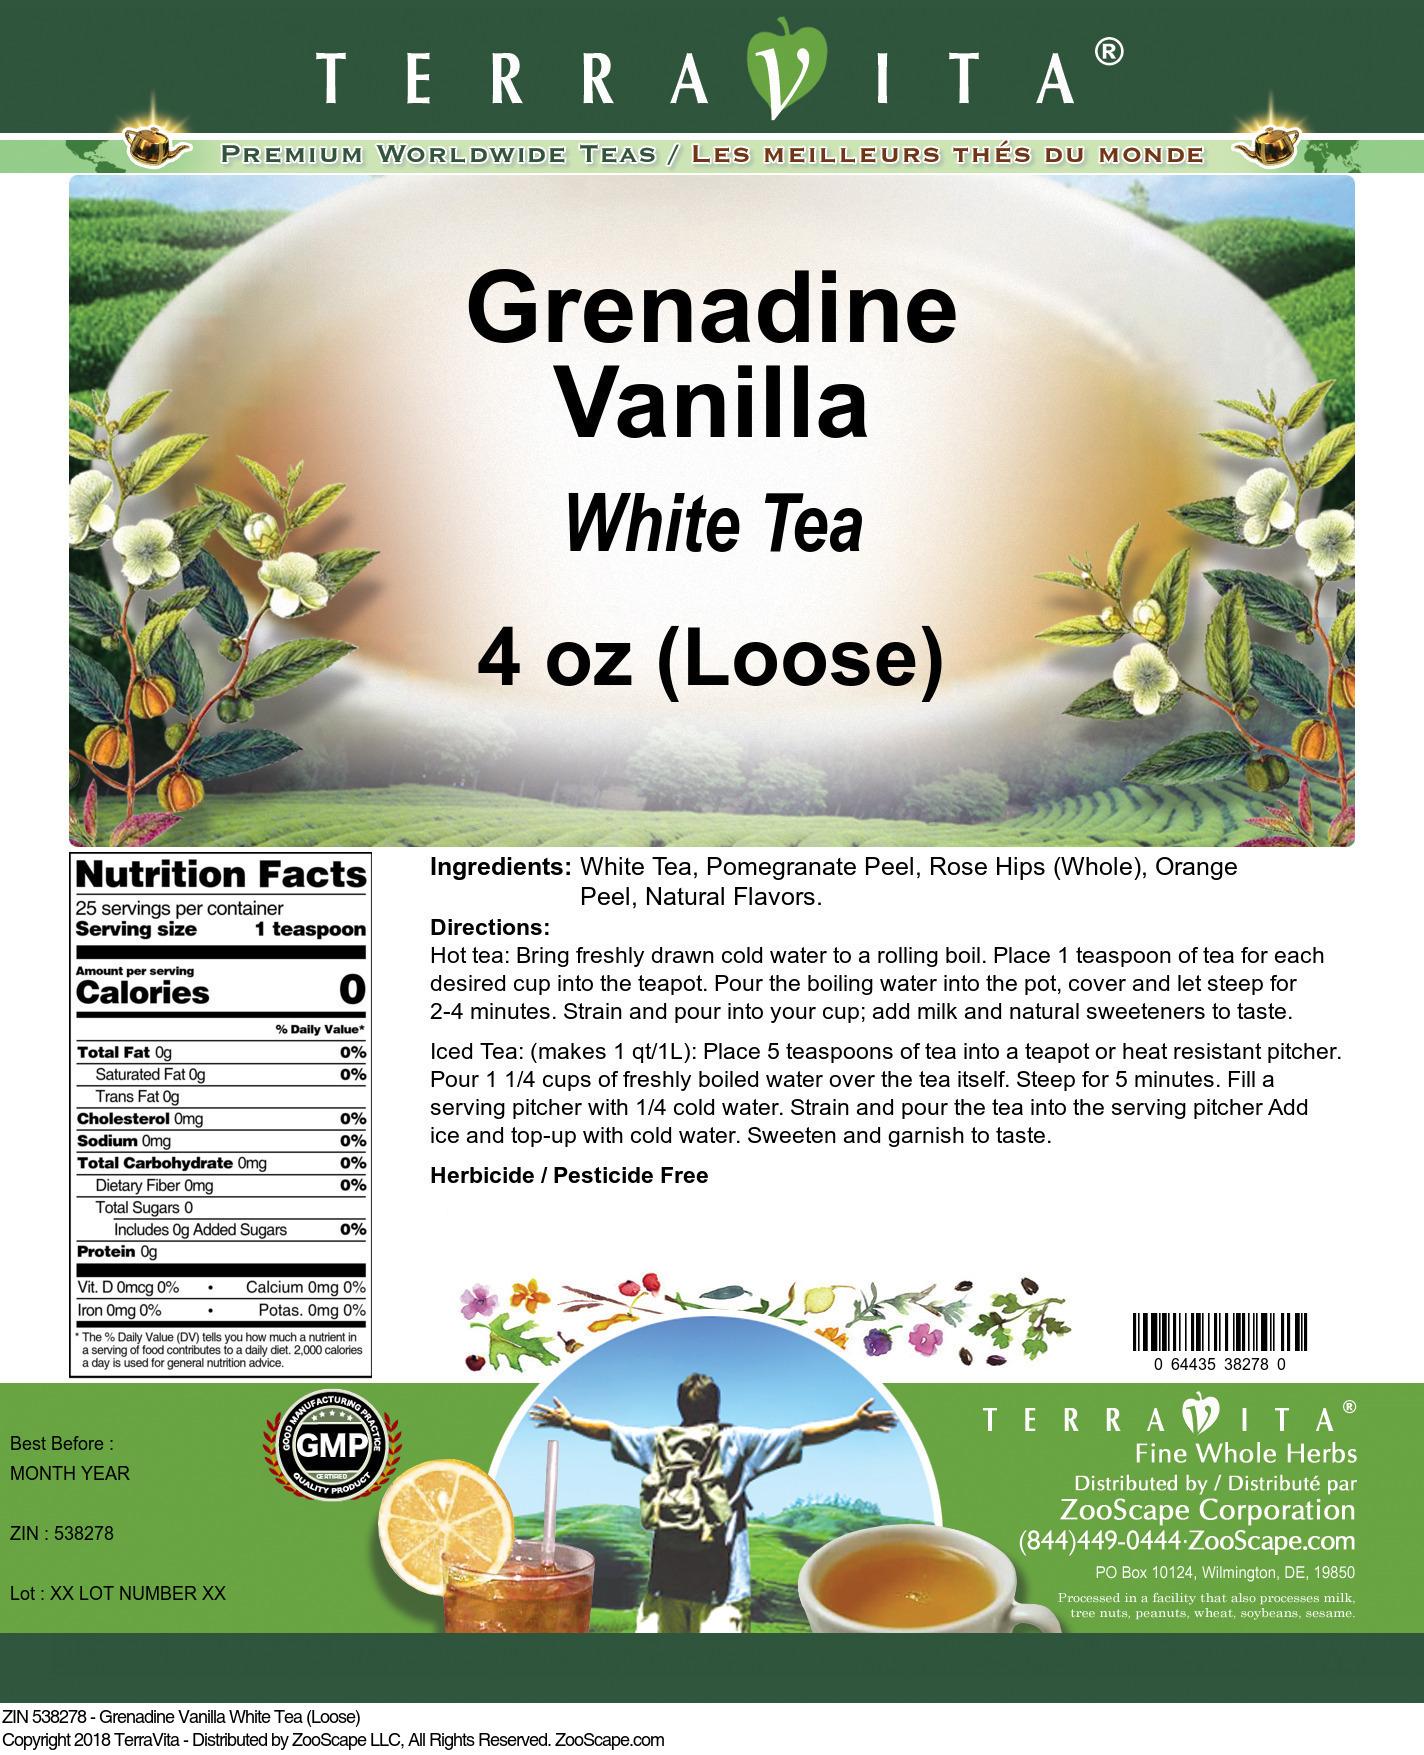 Grenadine Vanilla White Tea (Loose)